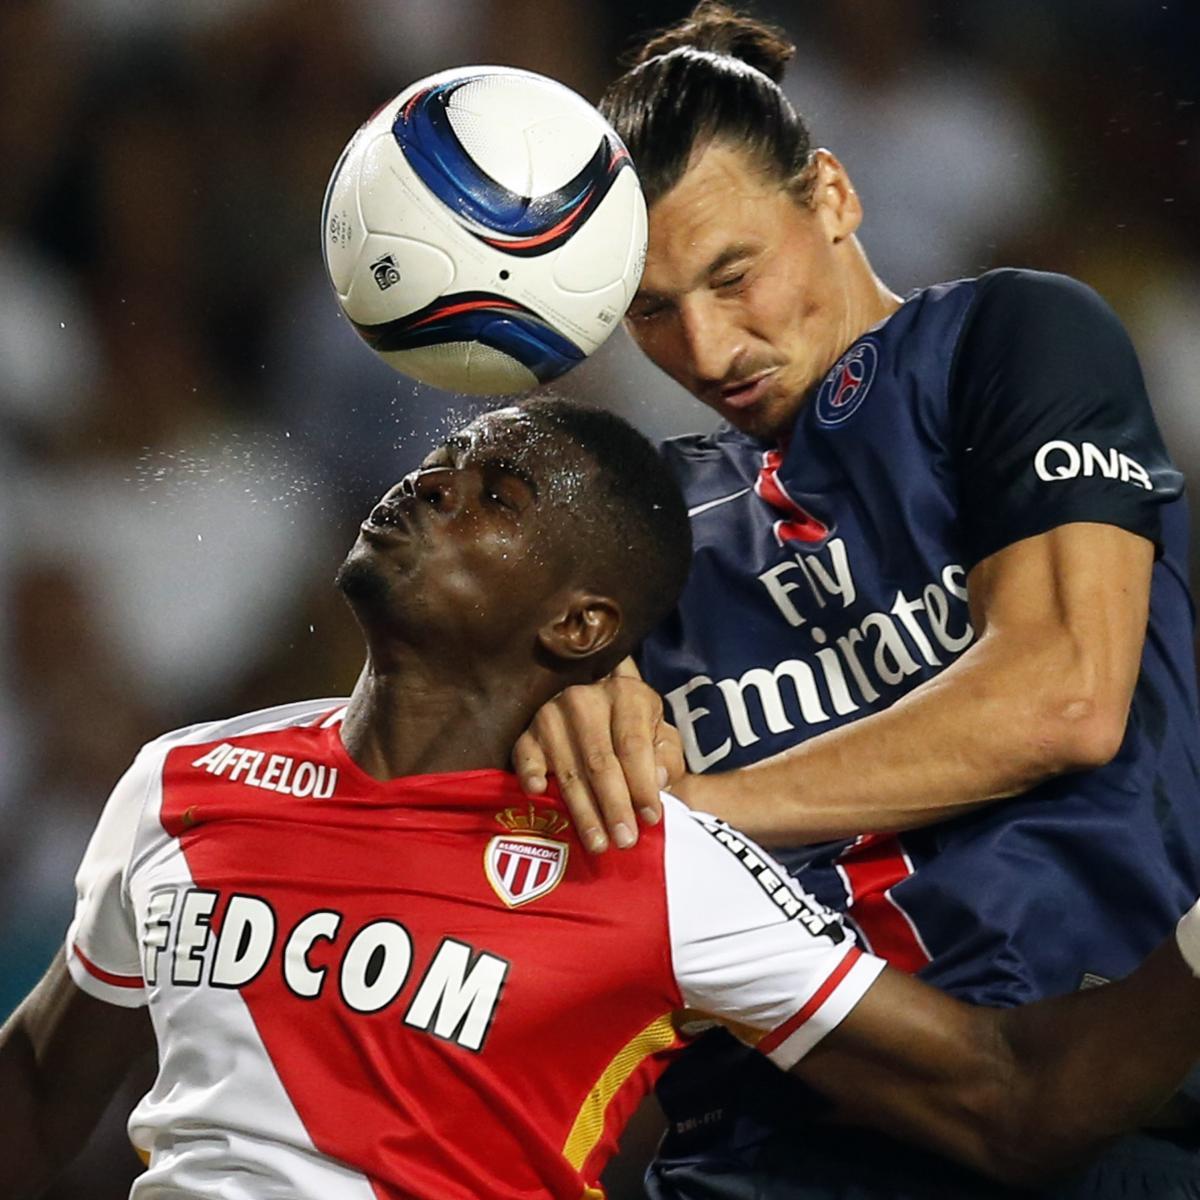 Bastia 0 3 Psg Match Report: Monaco Vs. PSG: Live Score, Highlights From Ligue 1